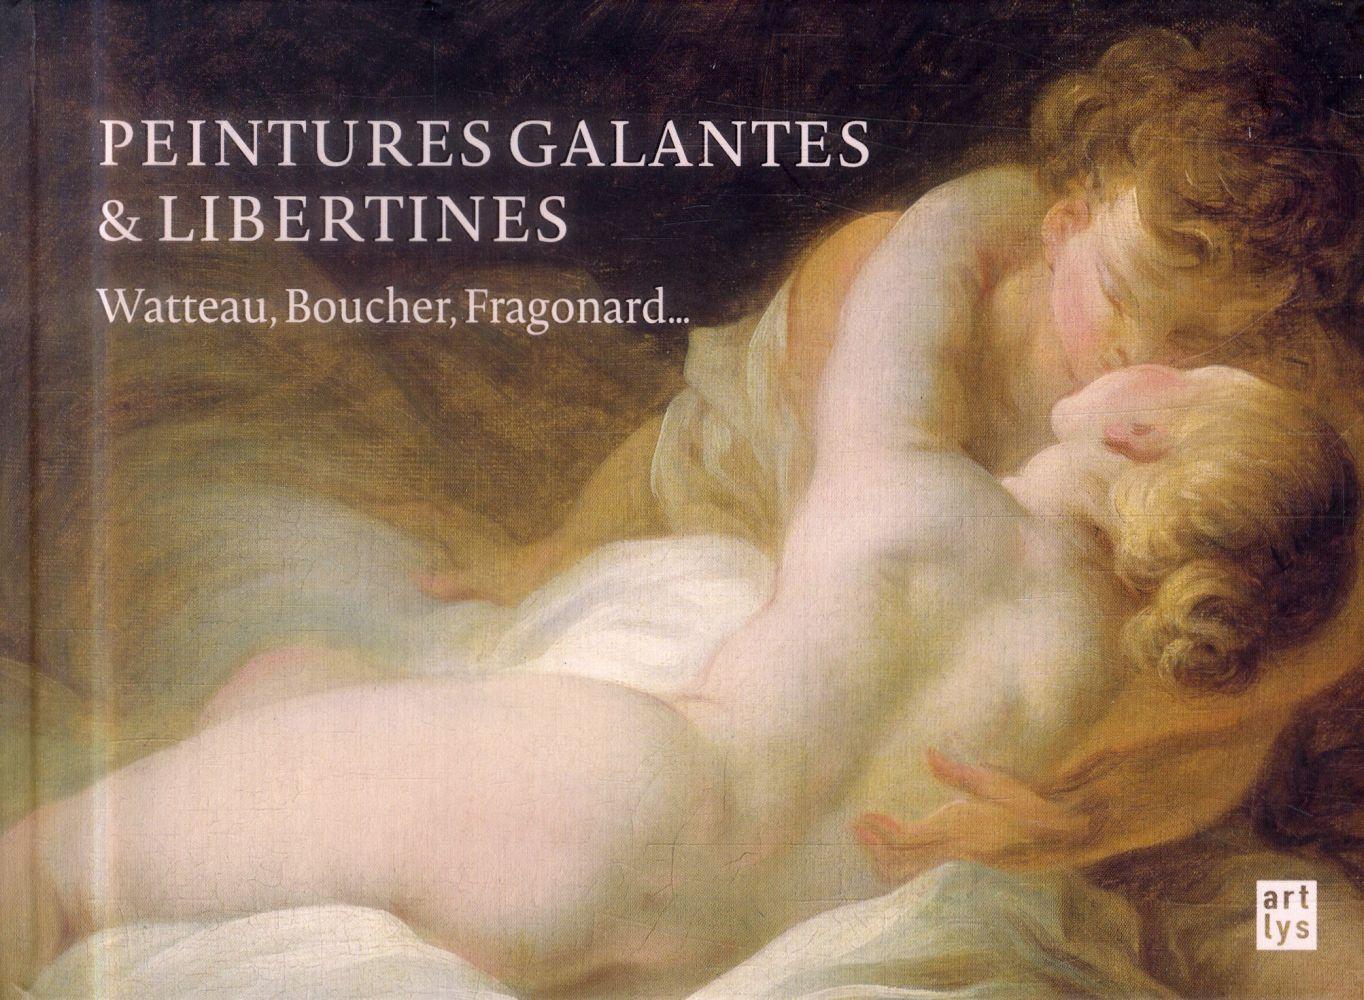 Peintures galantes et libertines